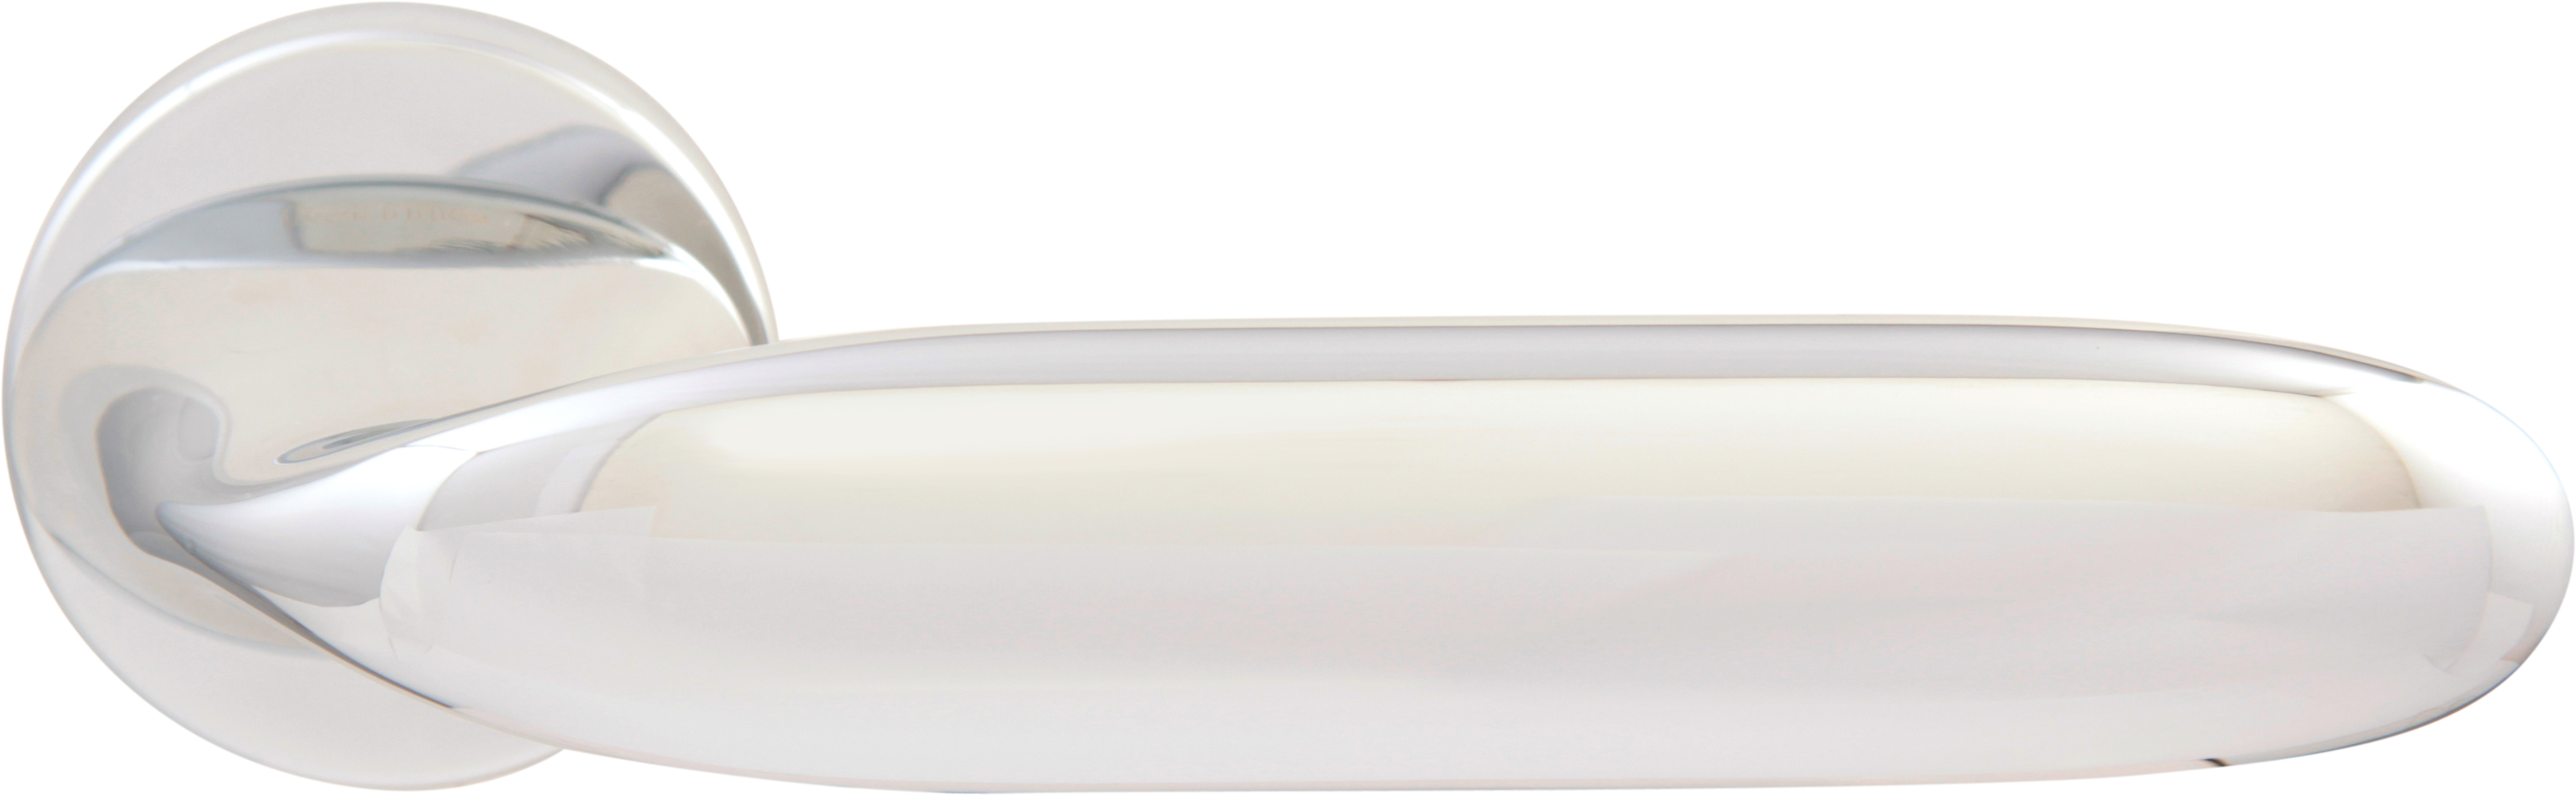 Дверная ручка на круглой розетке 493 R MOON CP (FIXA)